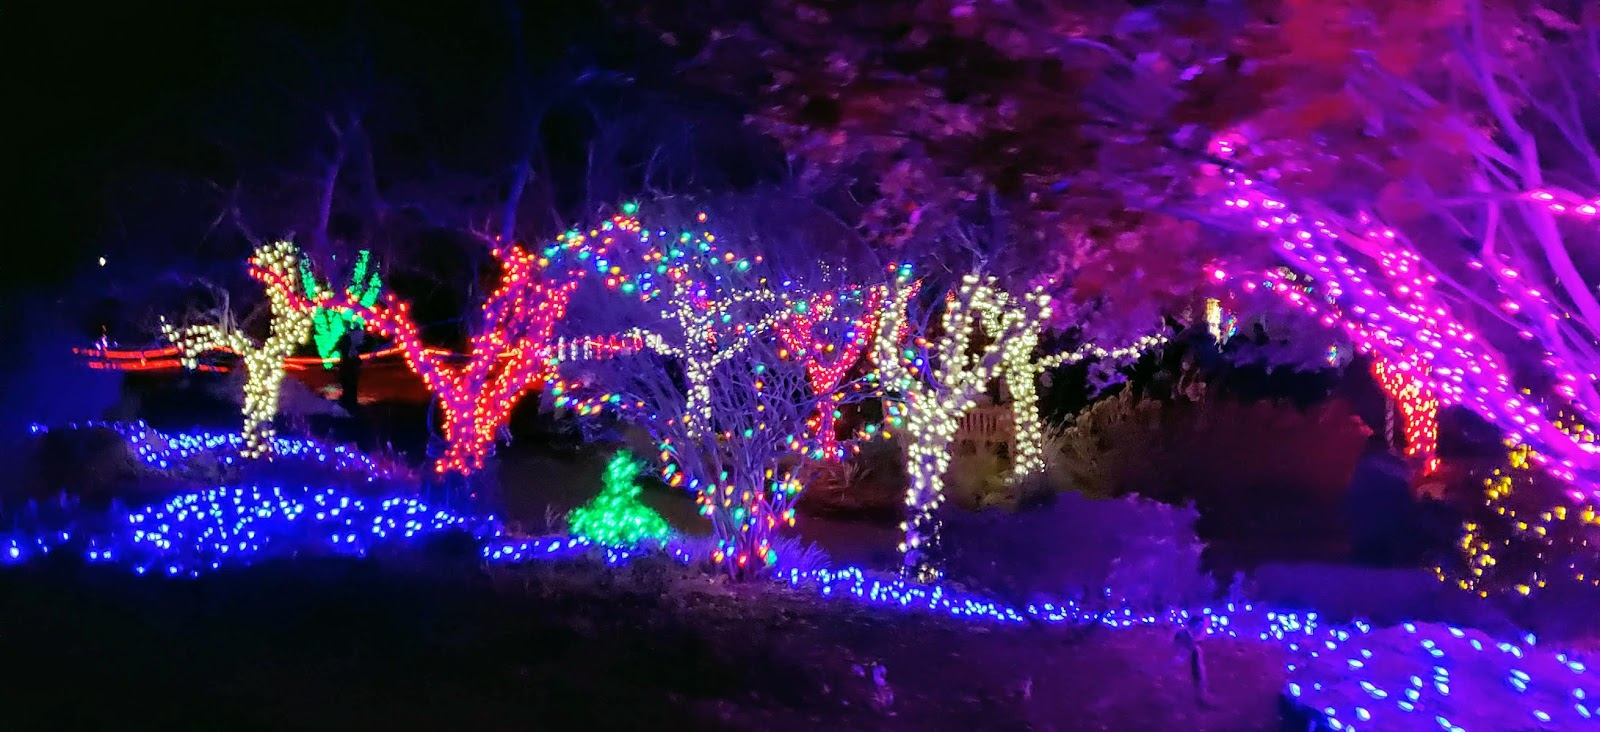 20181117 190914 - Meadowlark's Winter Walk Of Lights Meadowlark Botanical Gardens December 28